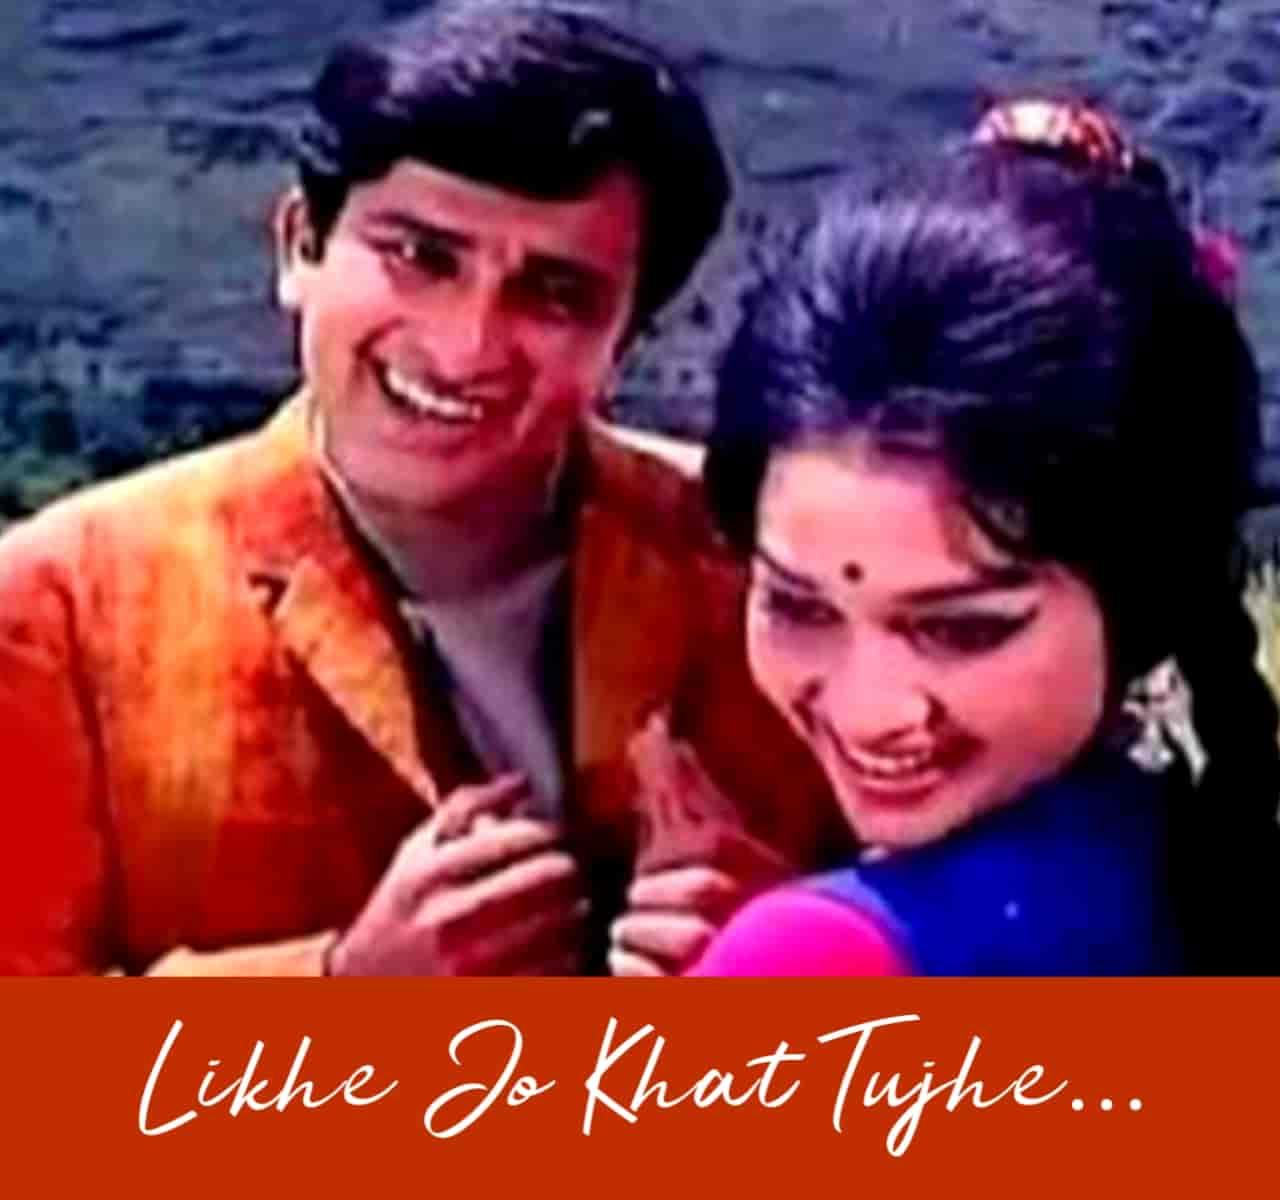 Likhe Jo khat Tujhe Hindi Love Song Lyrics, Sung By Mohammad Rafi.jpg